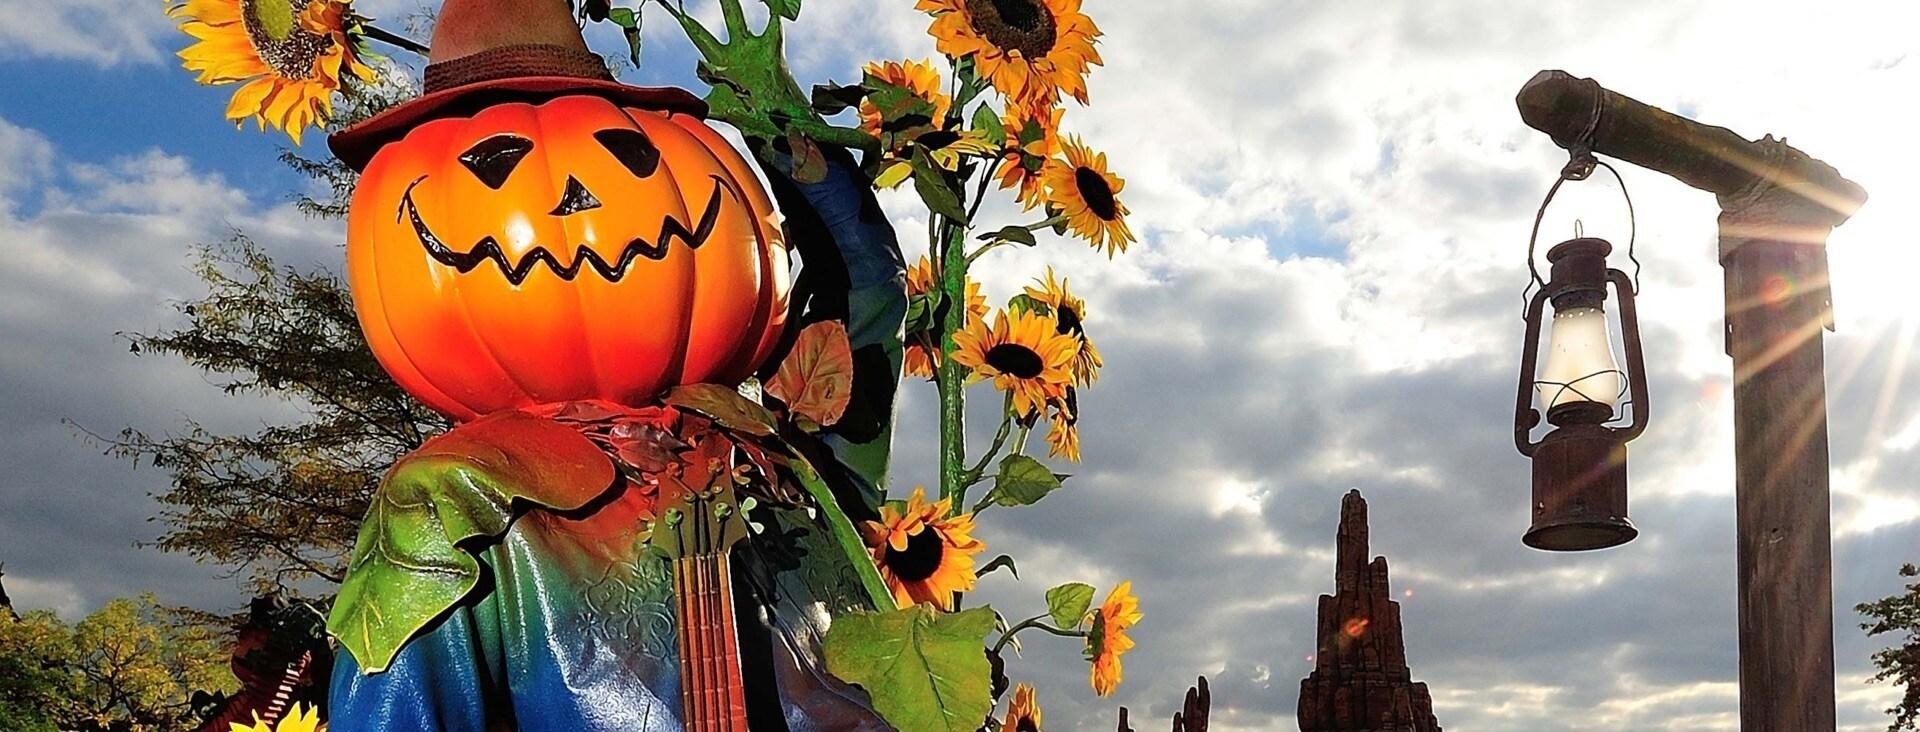 Festeggia Halloween a Disneyland Paris